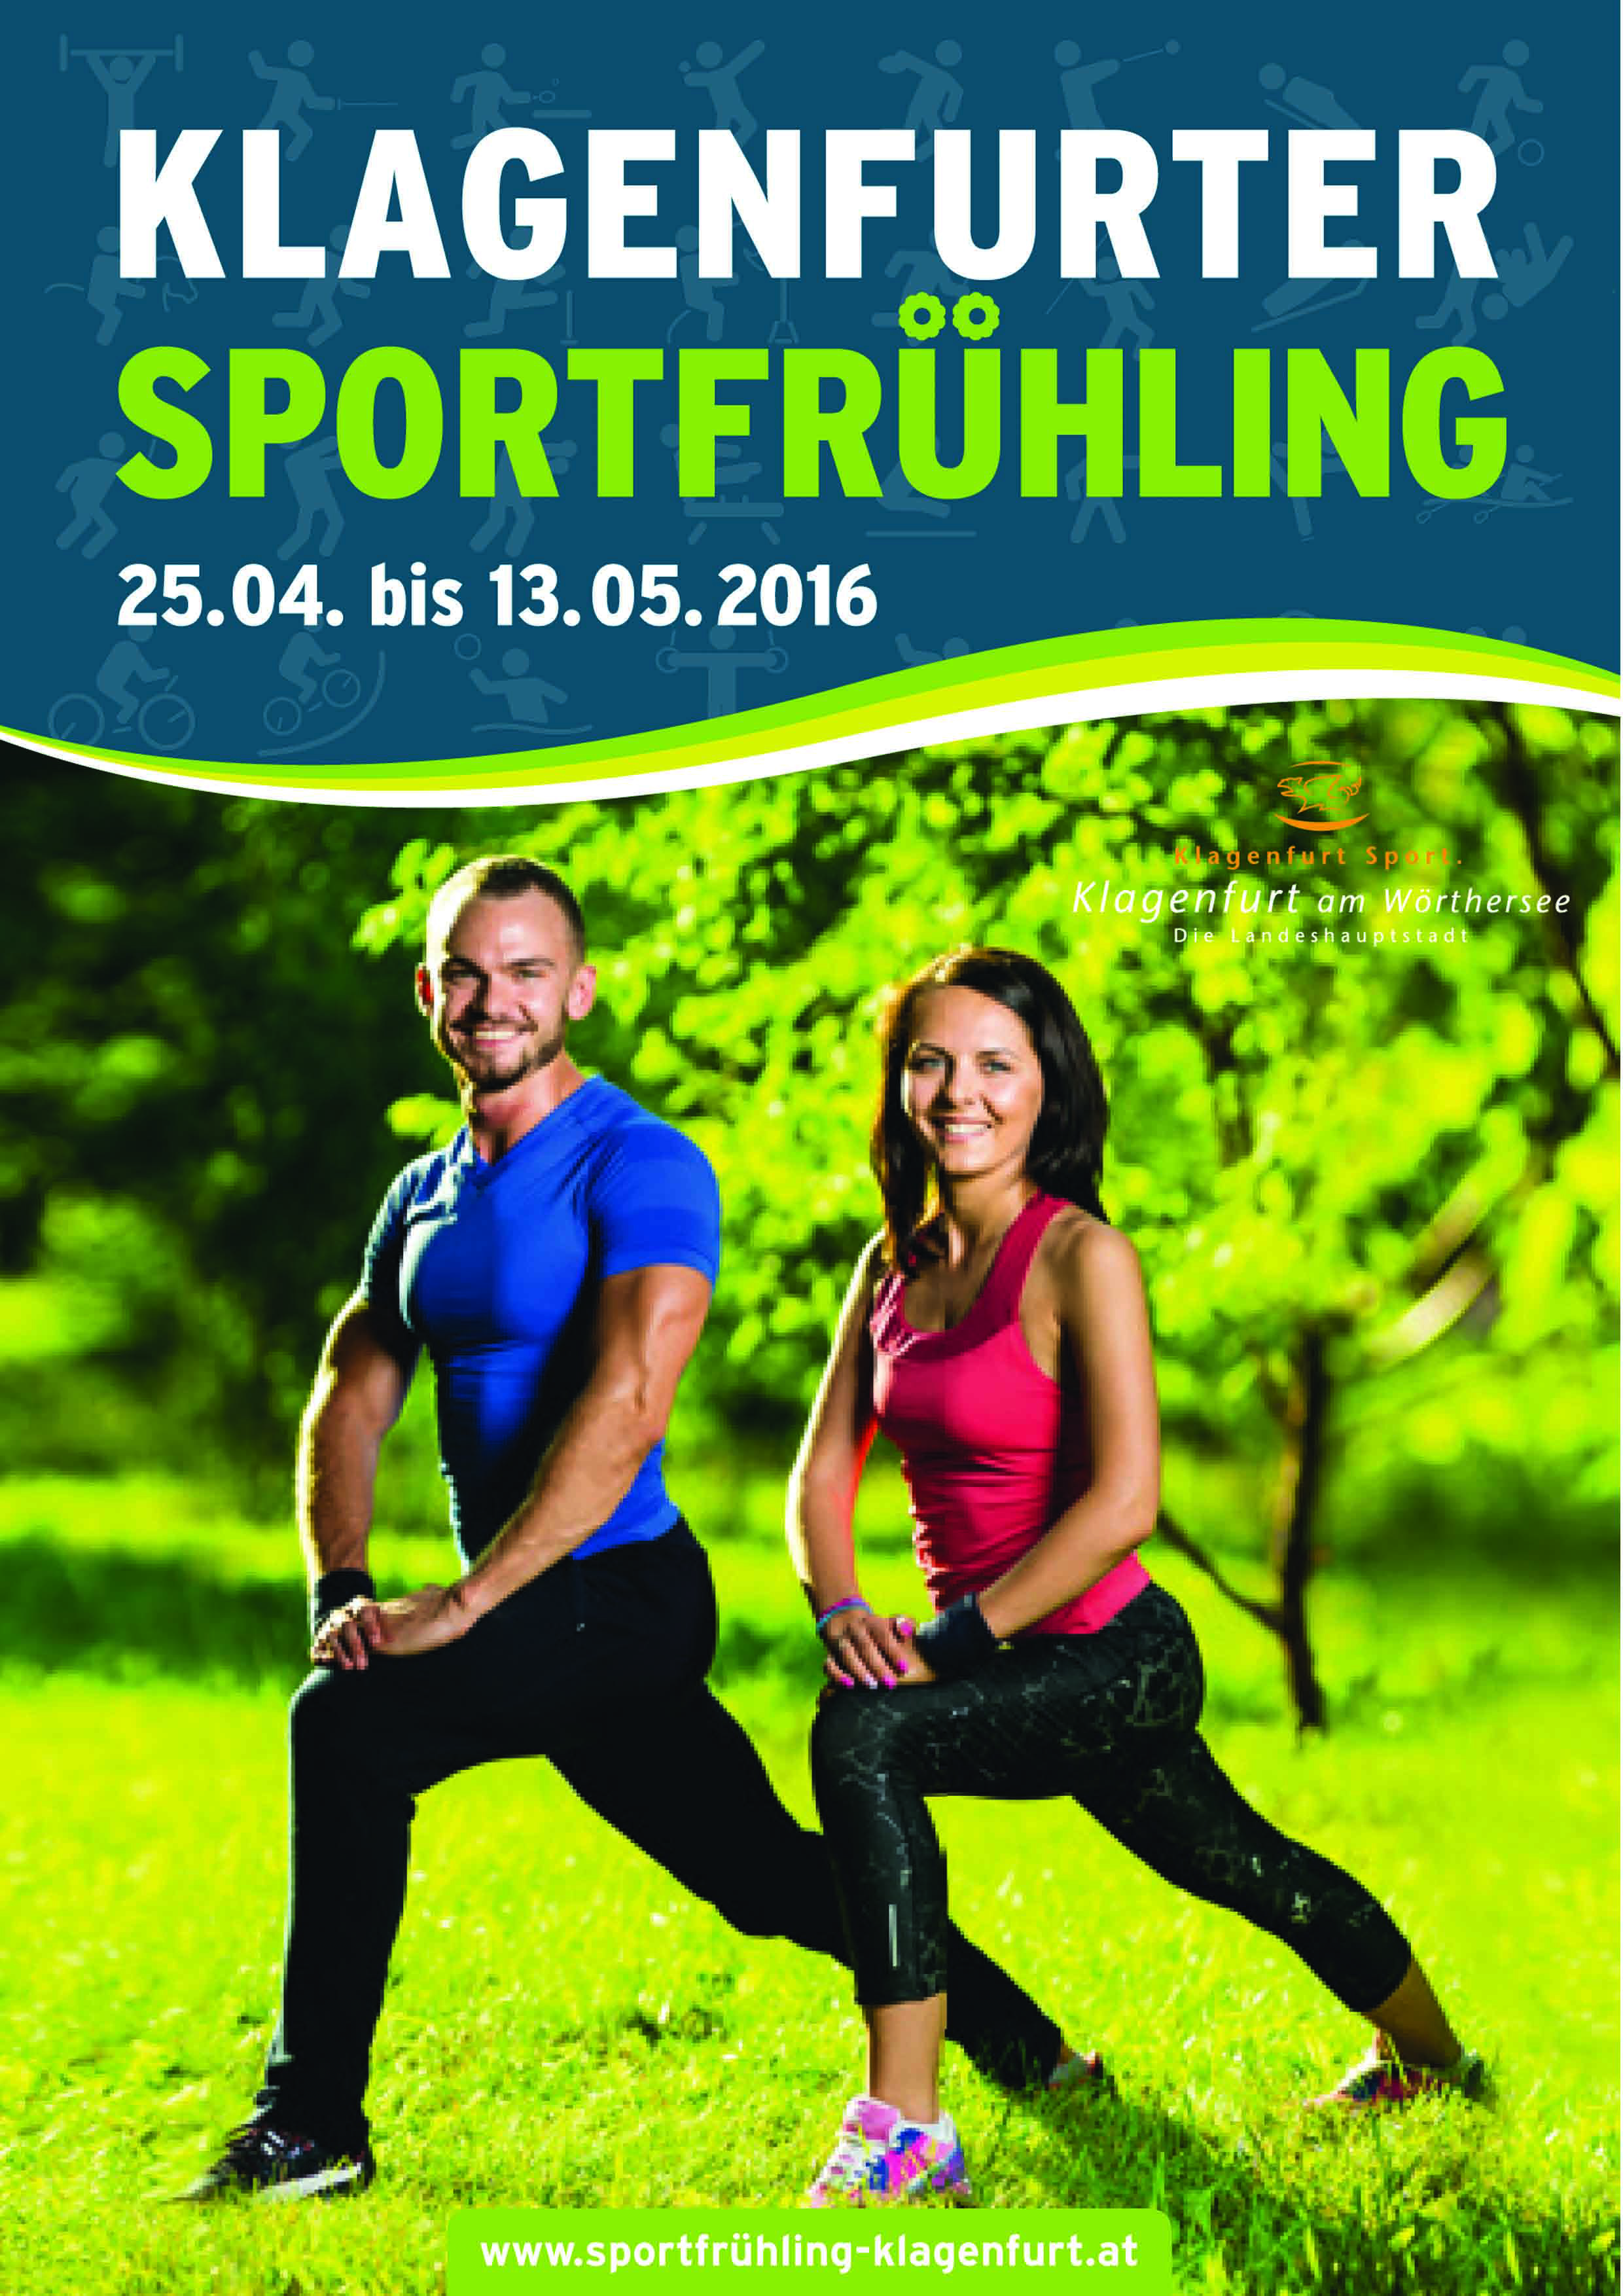 Klagenfurter Sportfrühling / Championkids